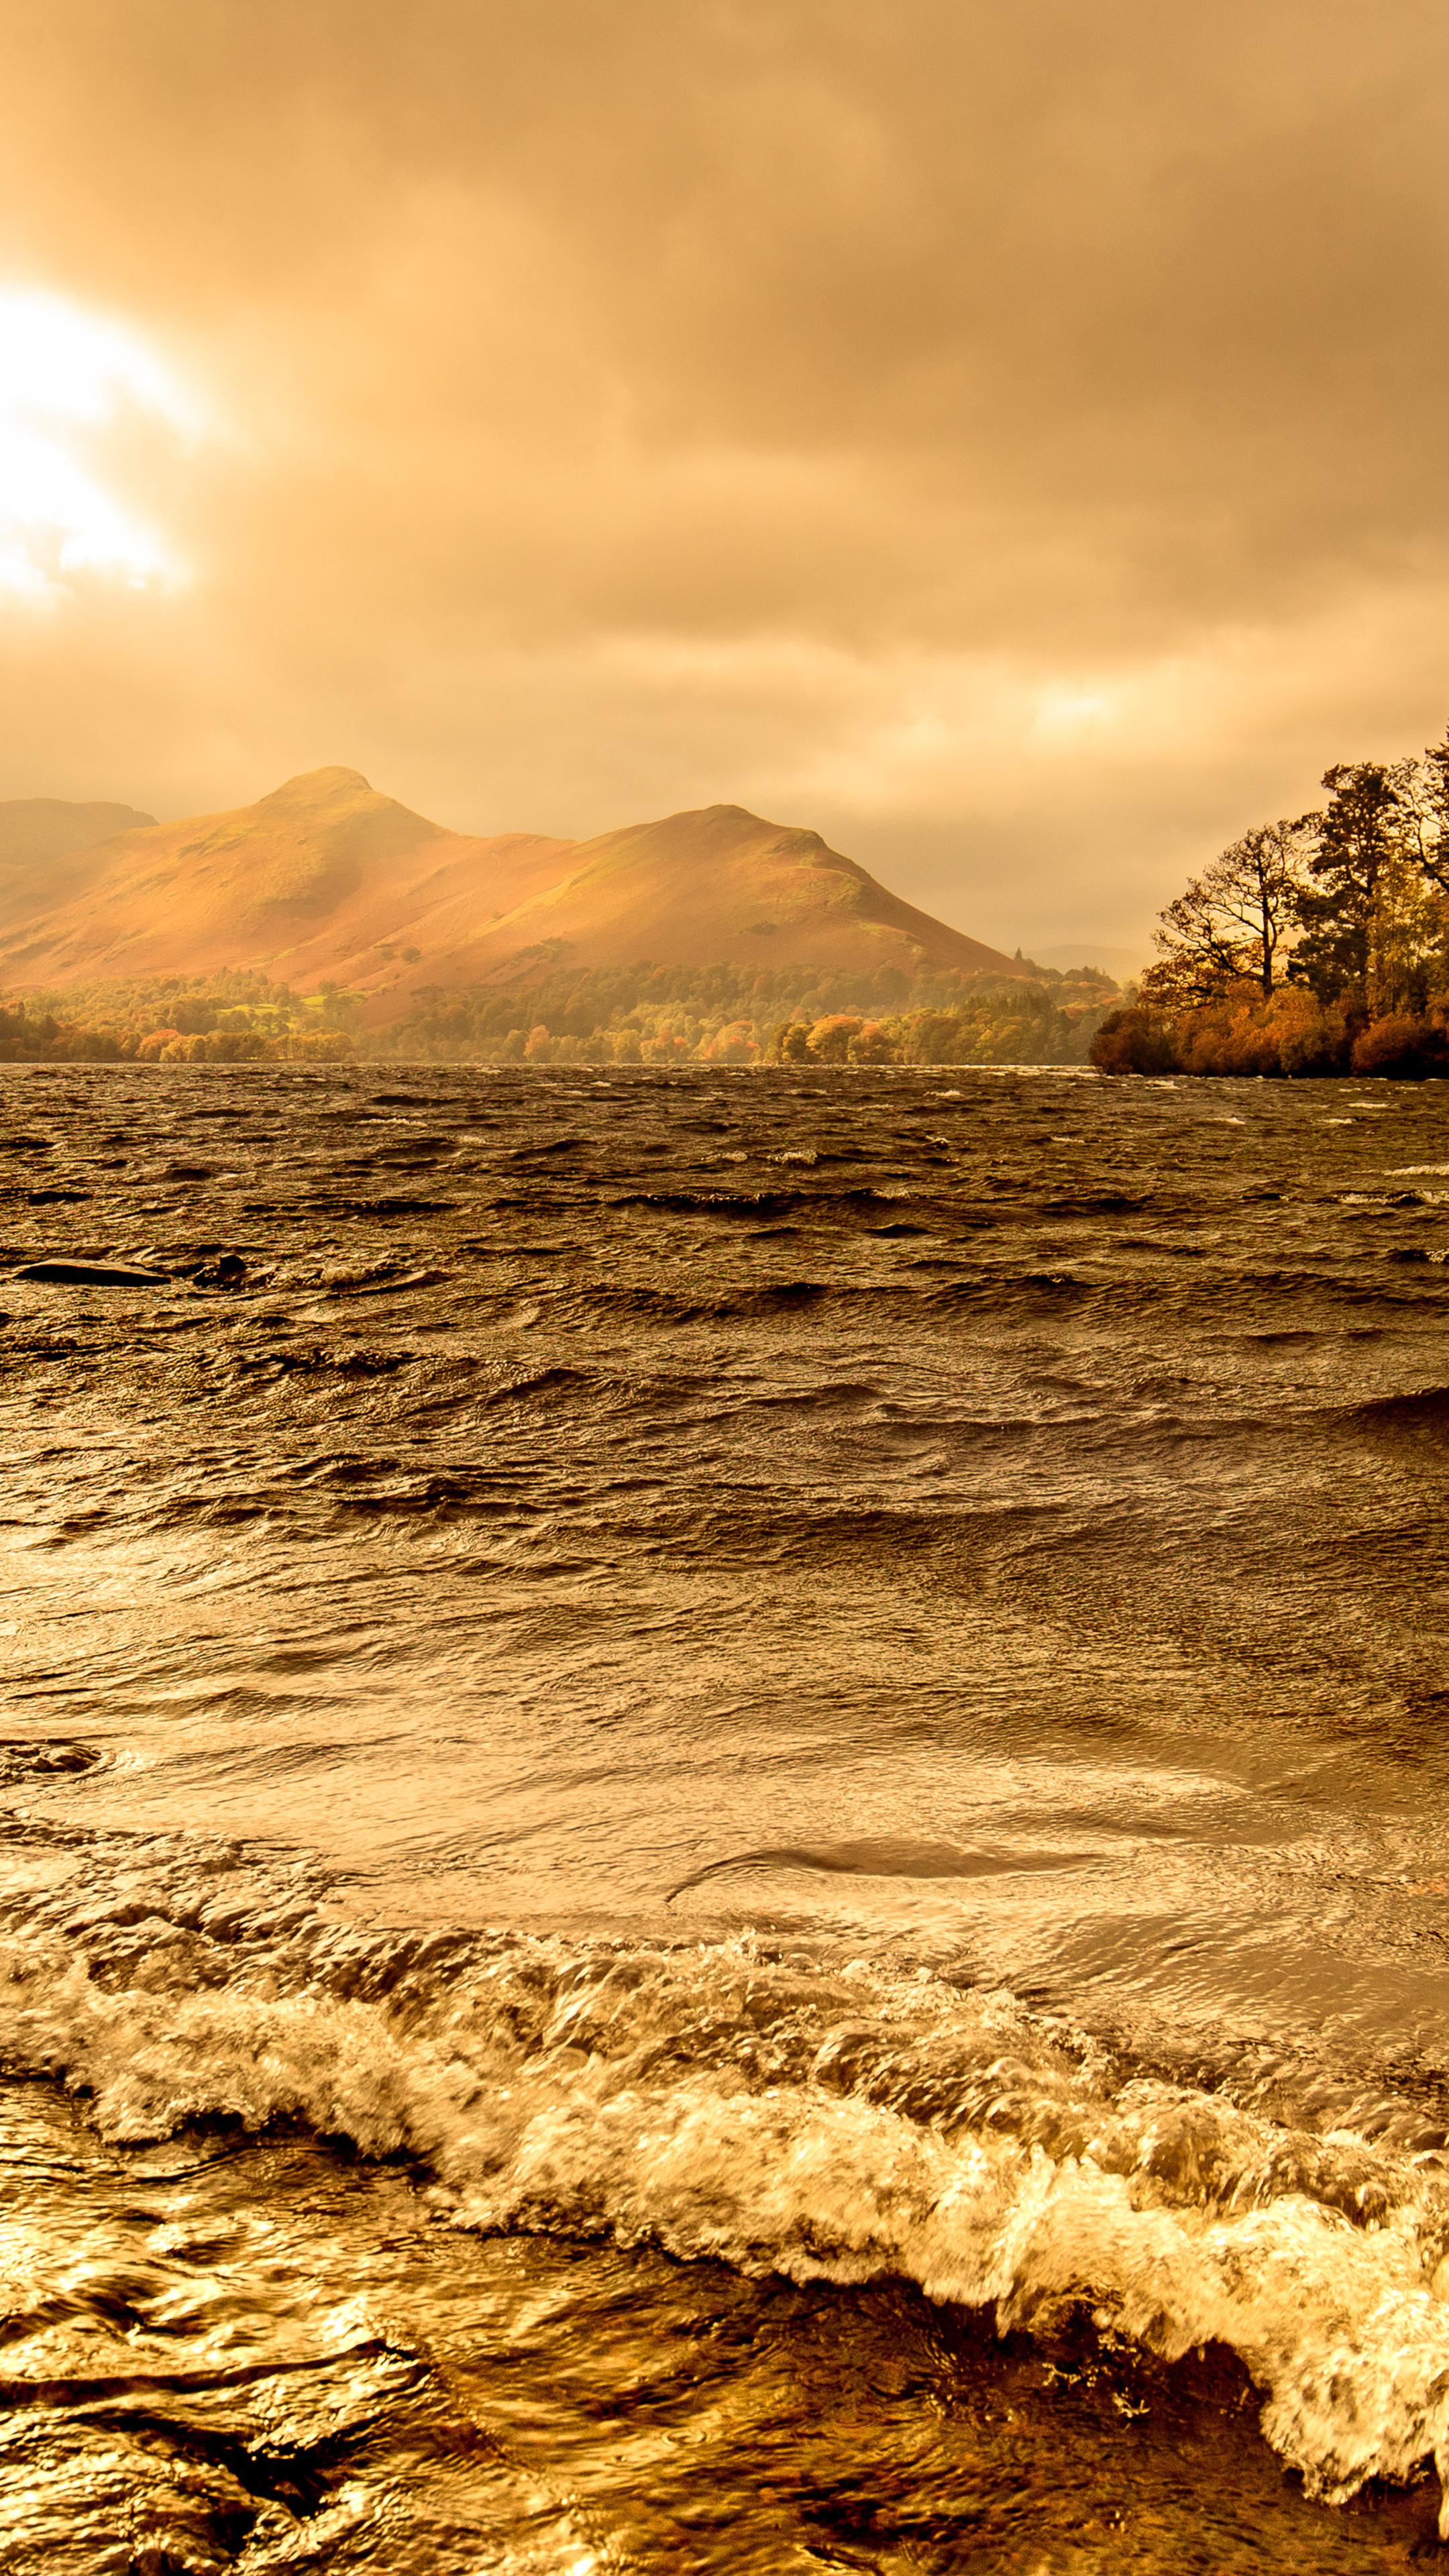 lake-windermere-autumn-season-4k-dz.jpg